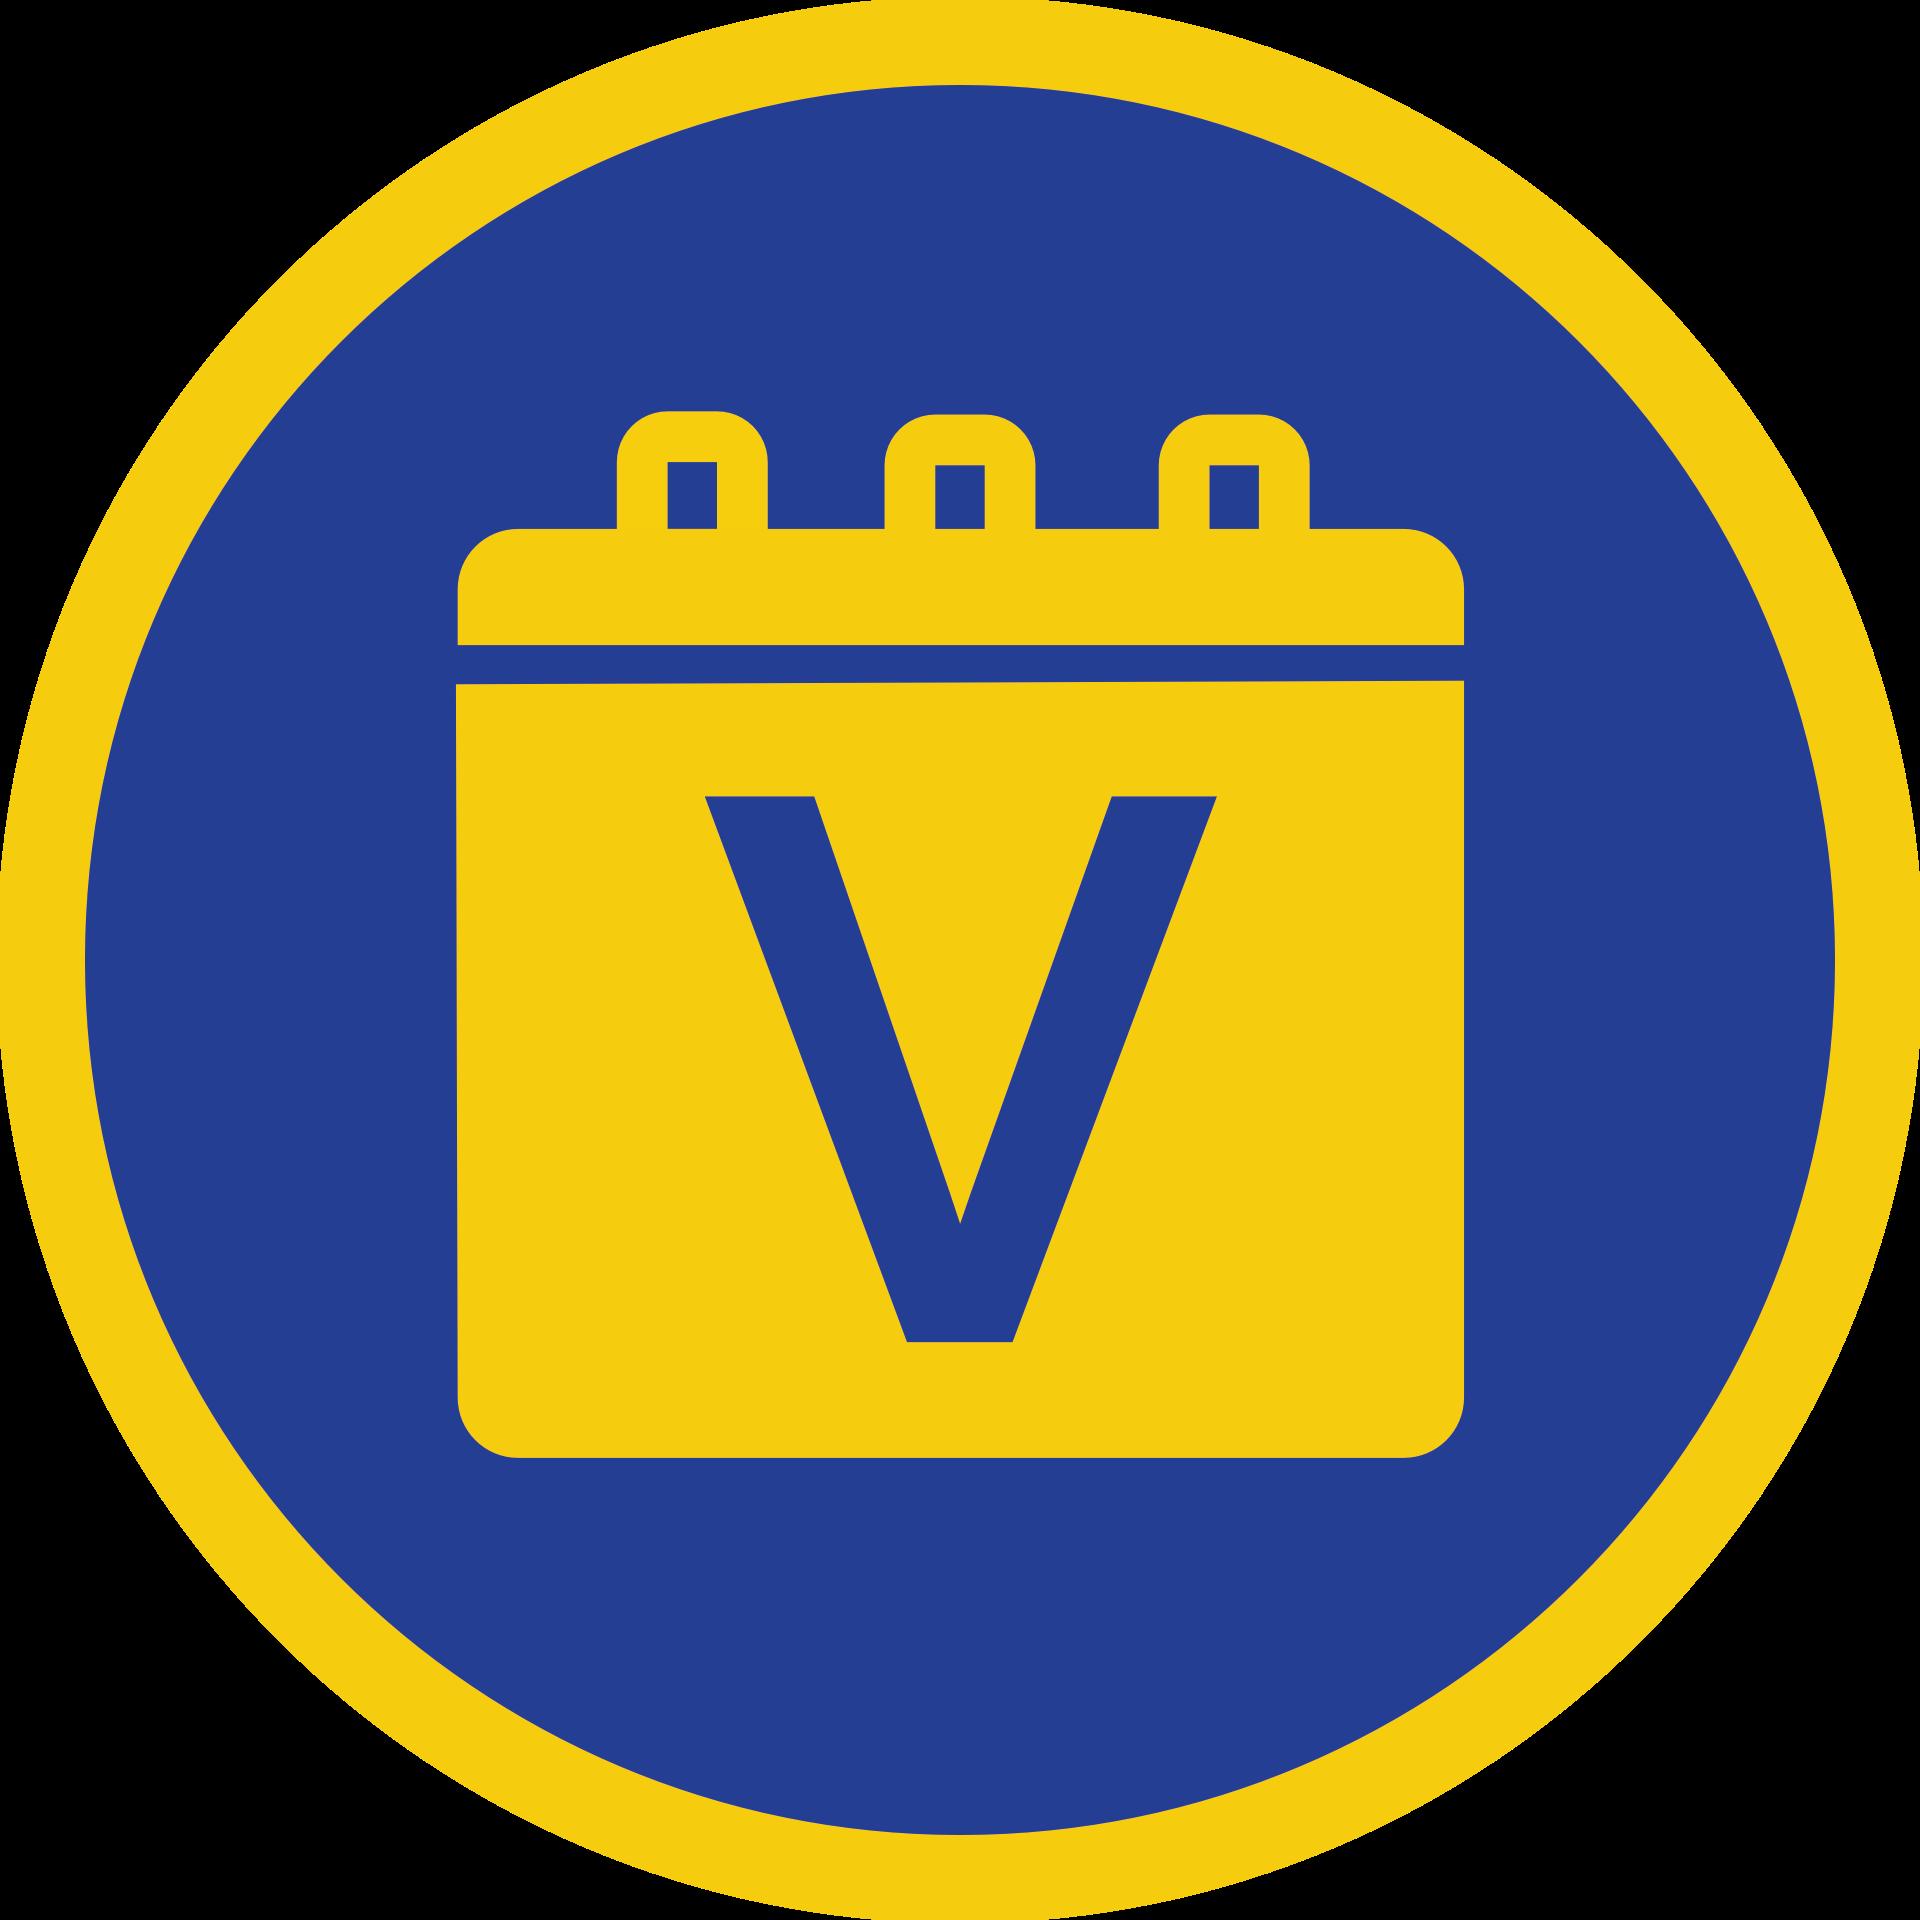 @veranstaltungstipps Profile Image | Linktree